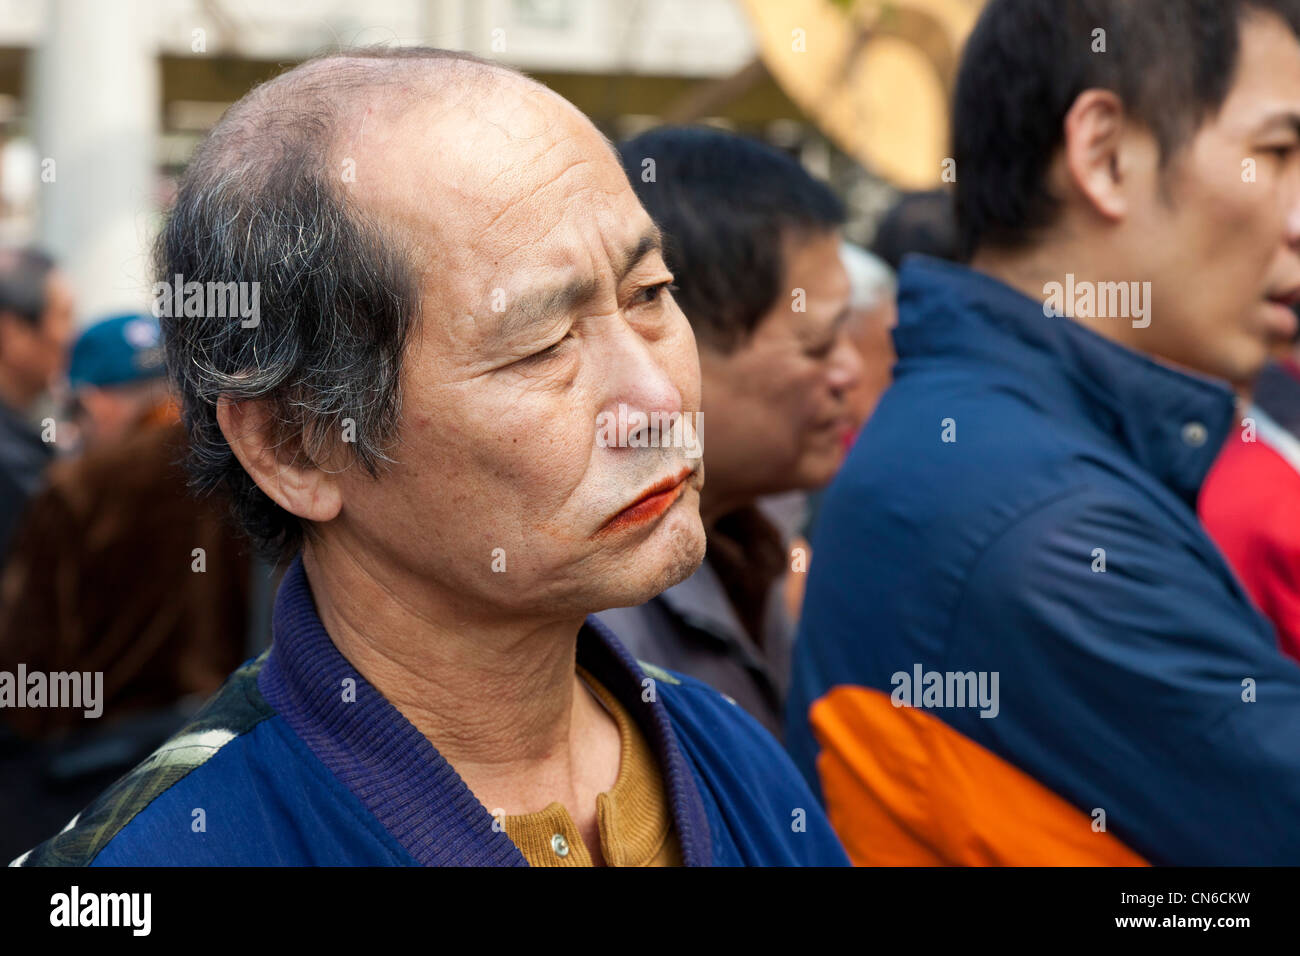 Taiwanese man chewing betel nut in Mangka Park Taipei Taiwan. JMH5678 - Stock Image